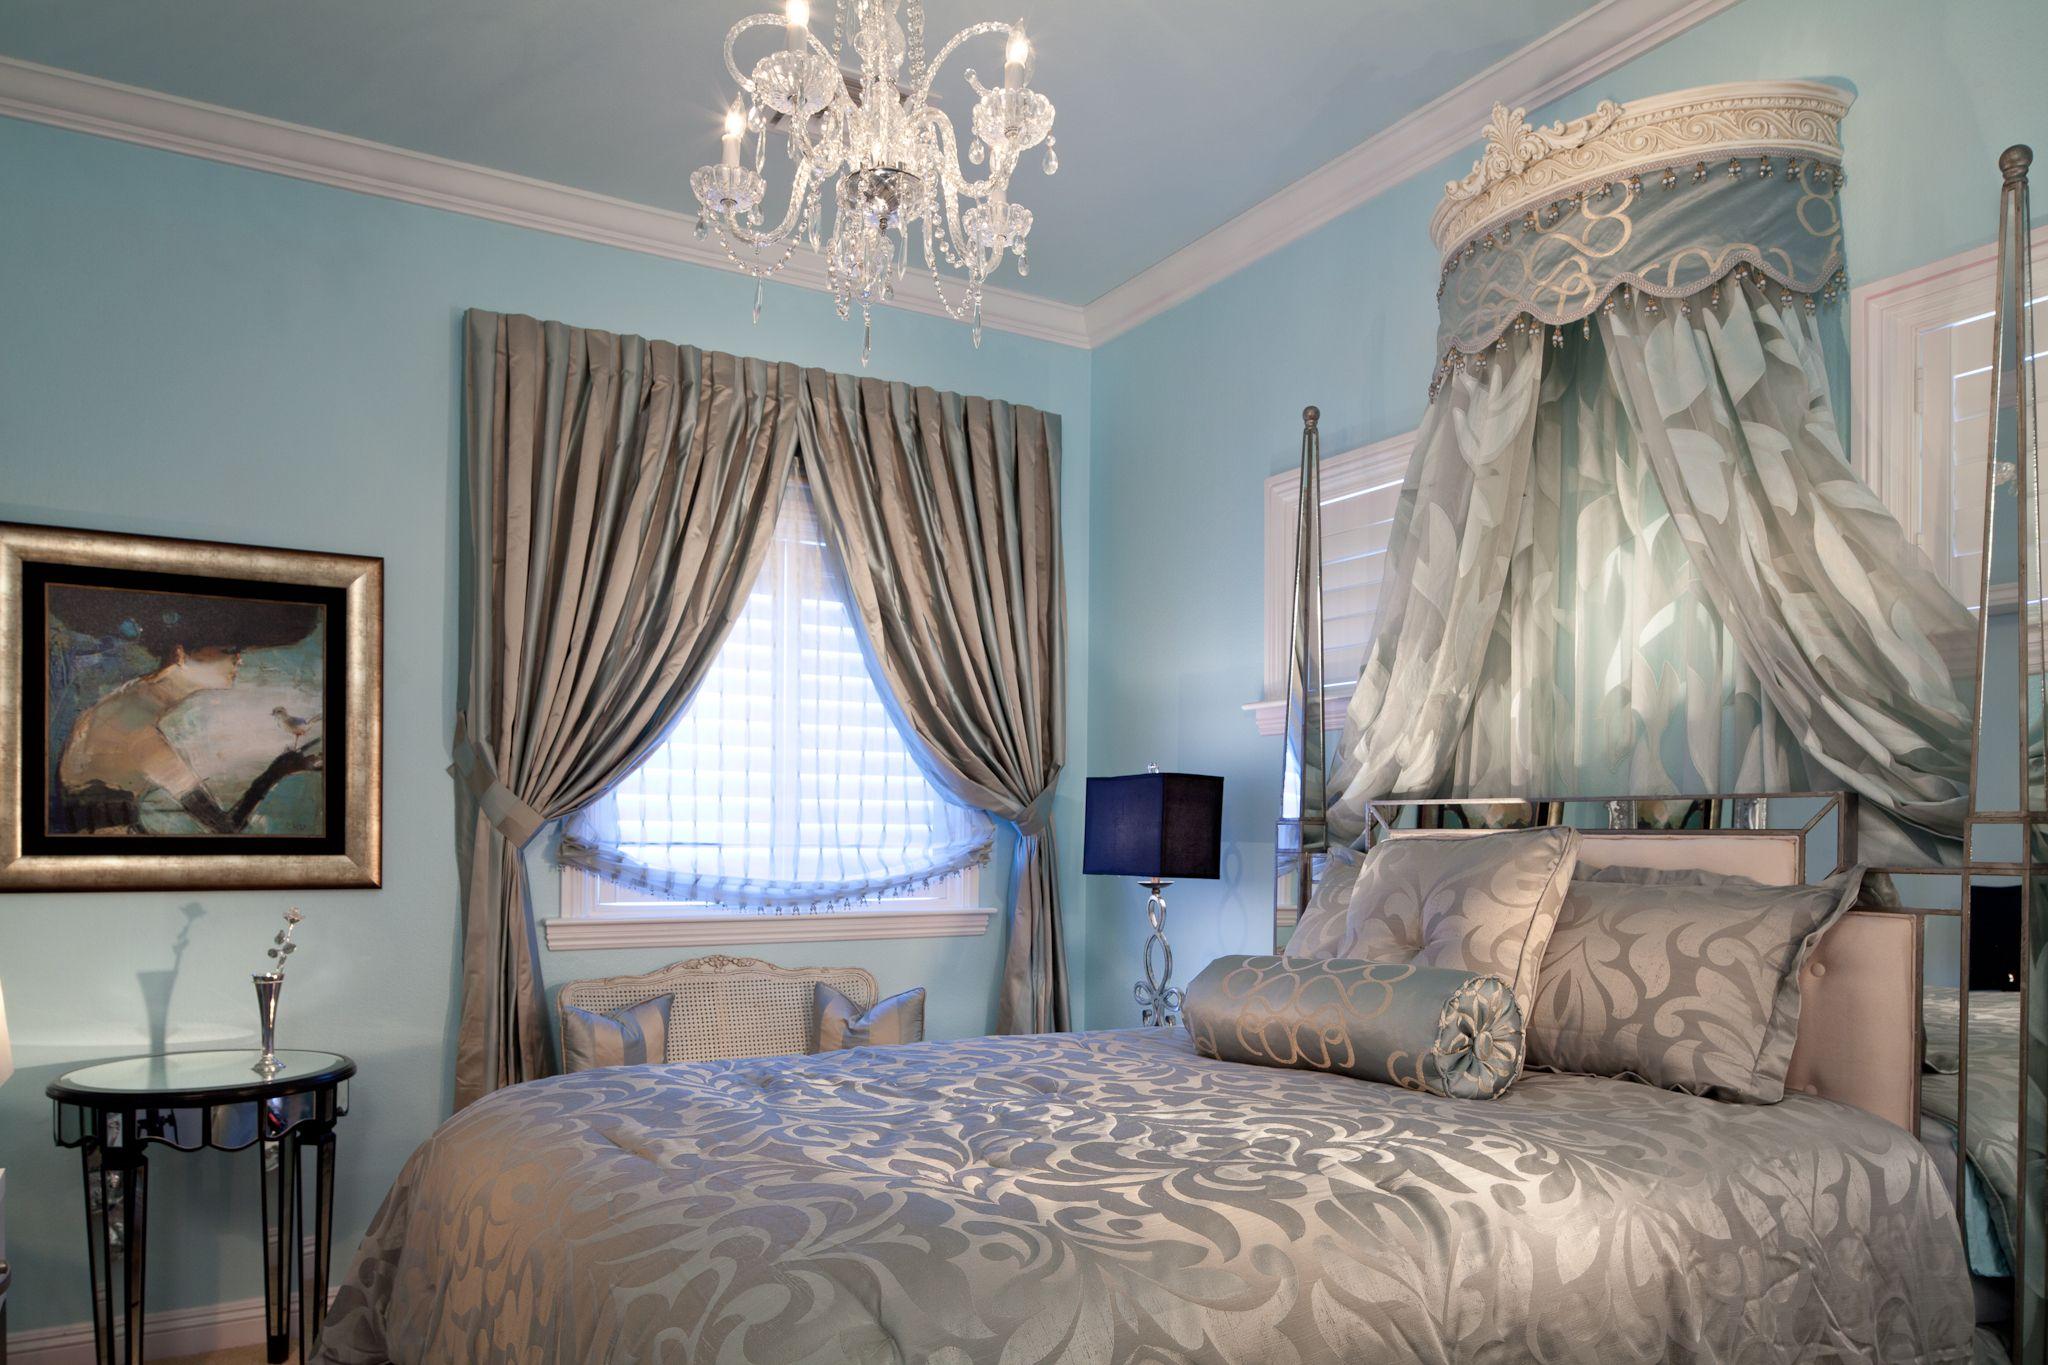 hollywood glamour bedding | Modern Vintage Hollywood Glamour Design ...